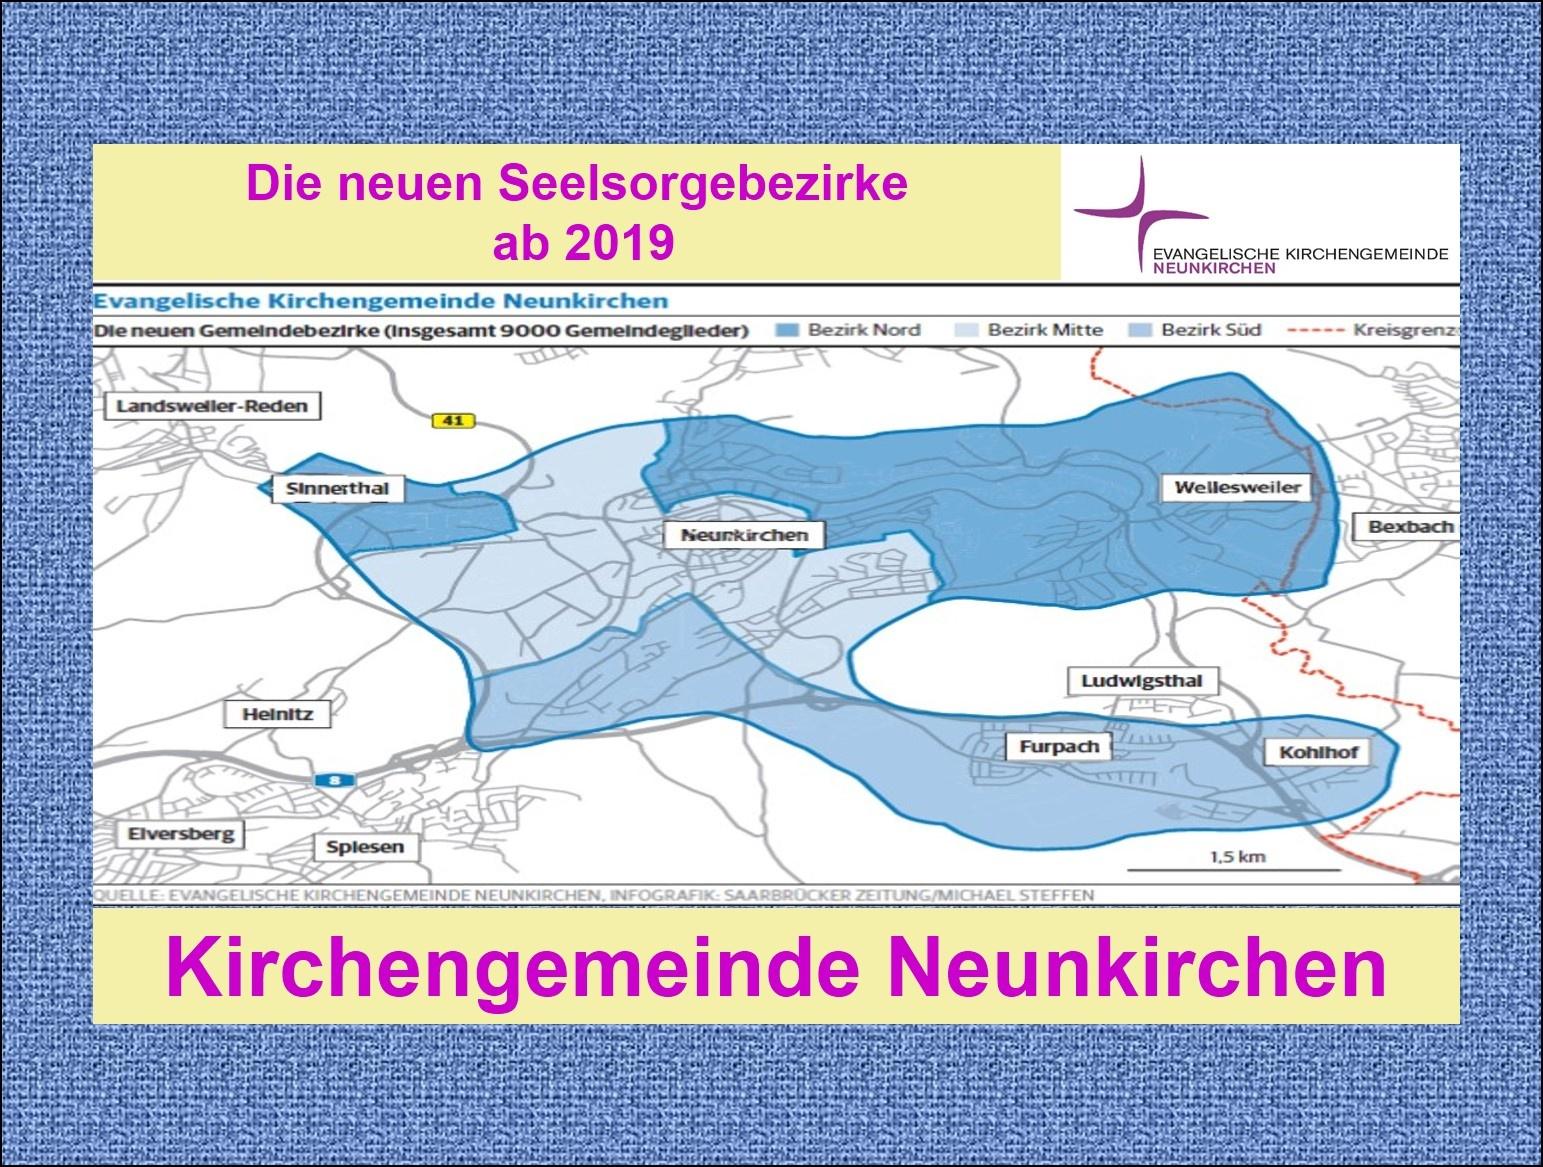 NK_Seelsorgebezirk_Nord_Mitte_Süd